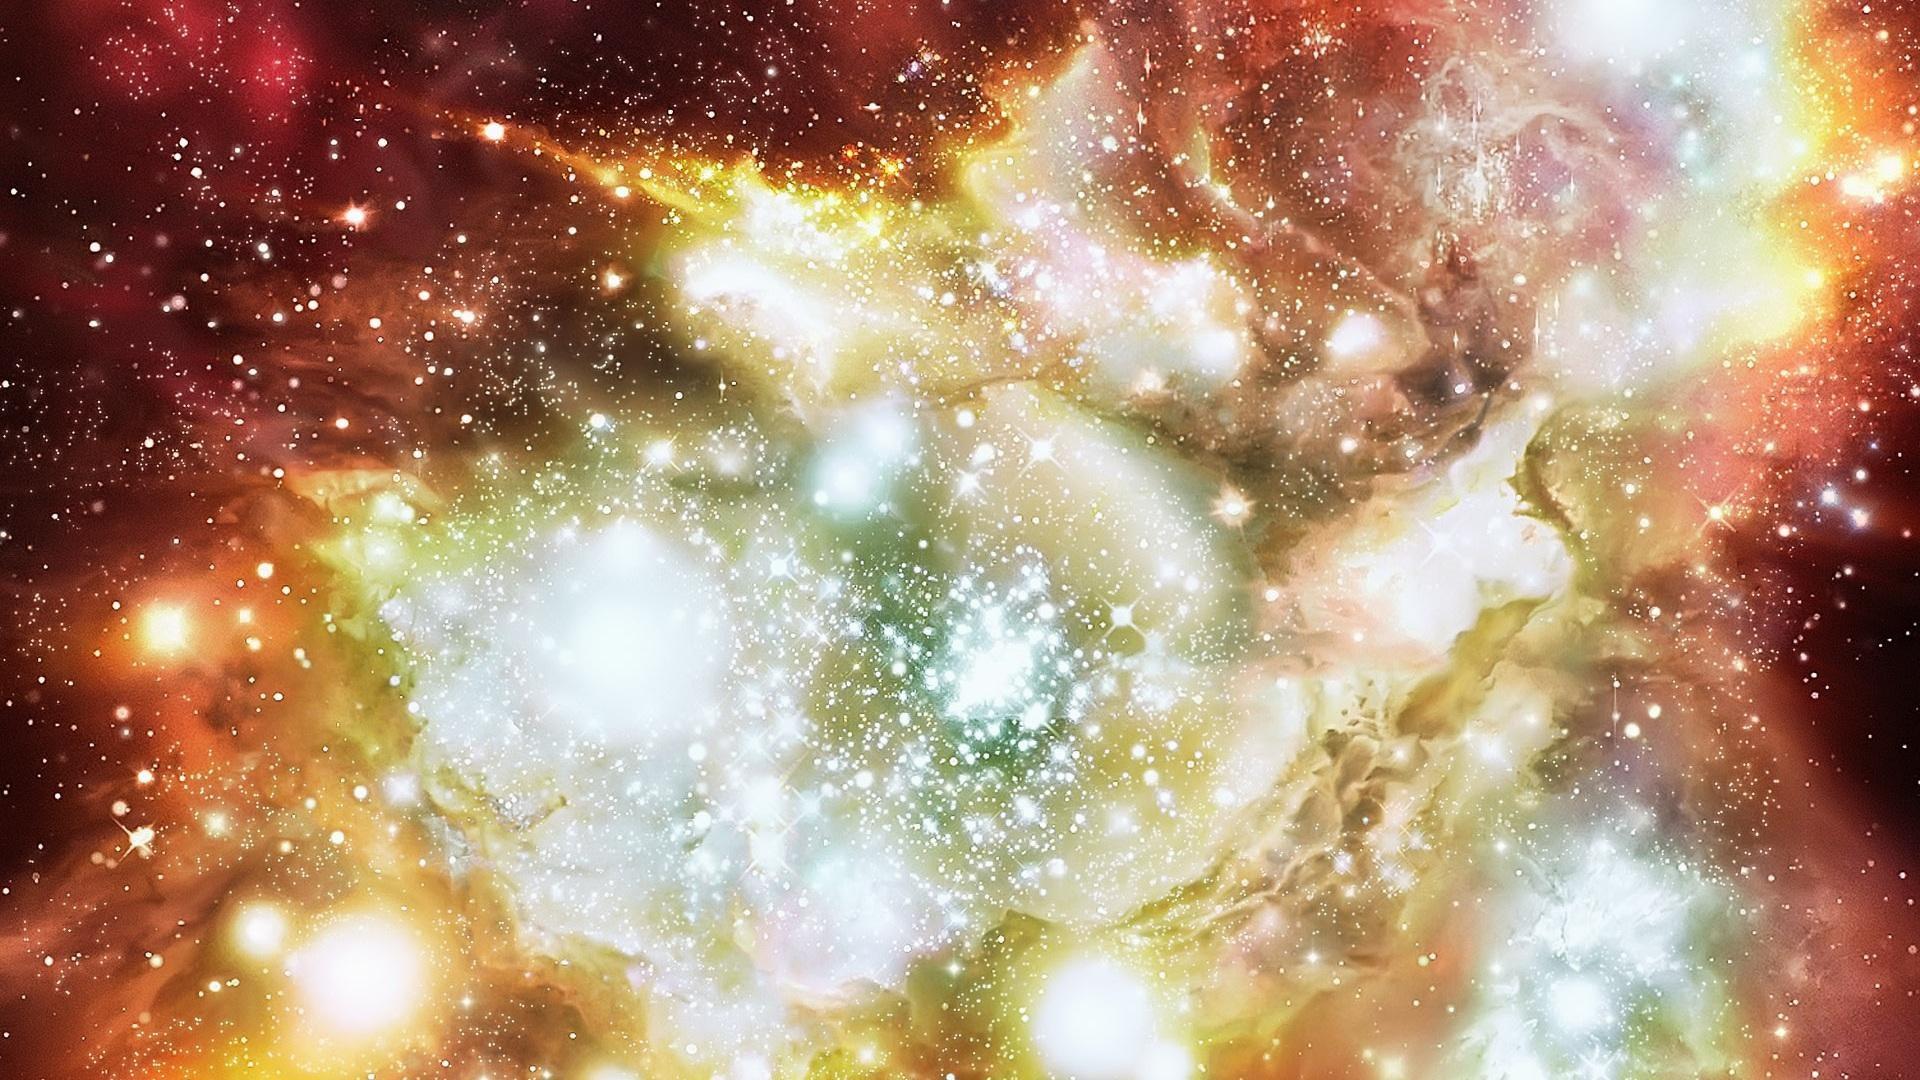 wallpaper.wiki-Hubble-HD-Images-1920×1080-PIC-WPD003230